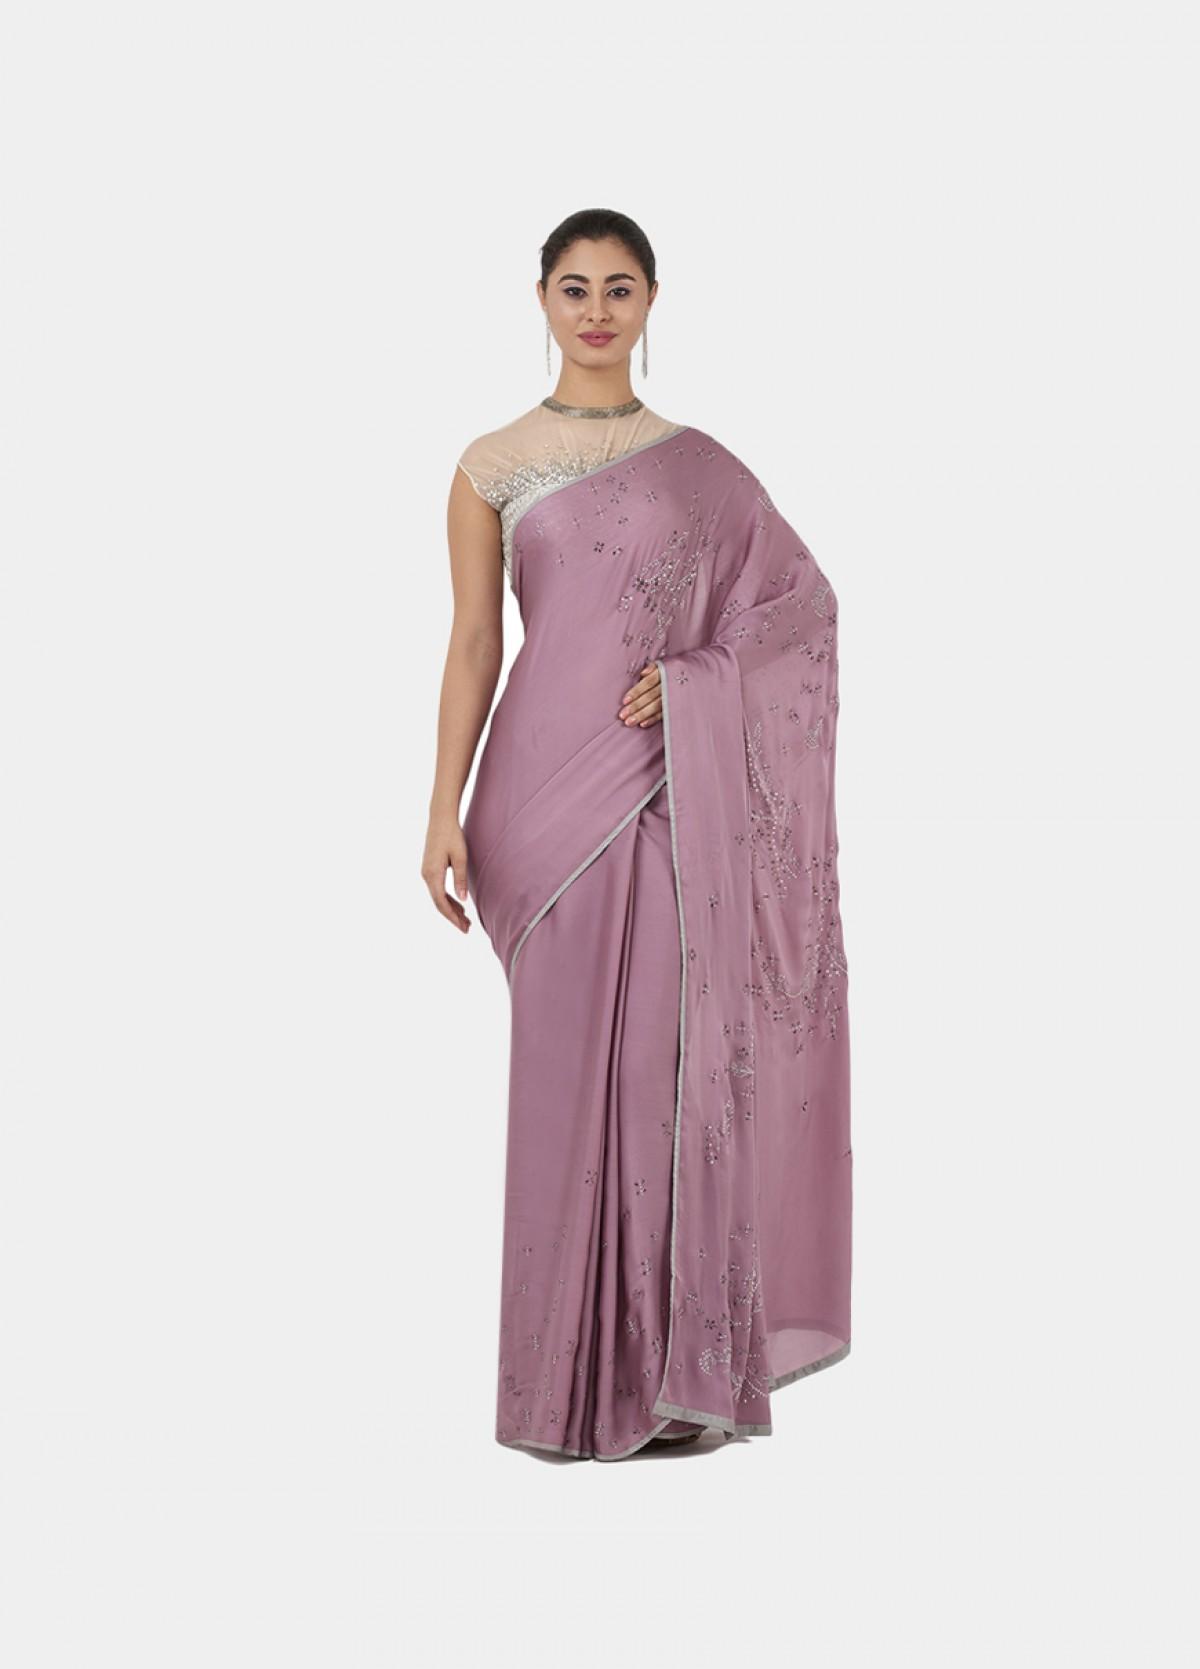 The Randiance Sari